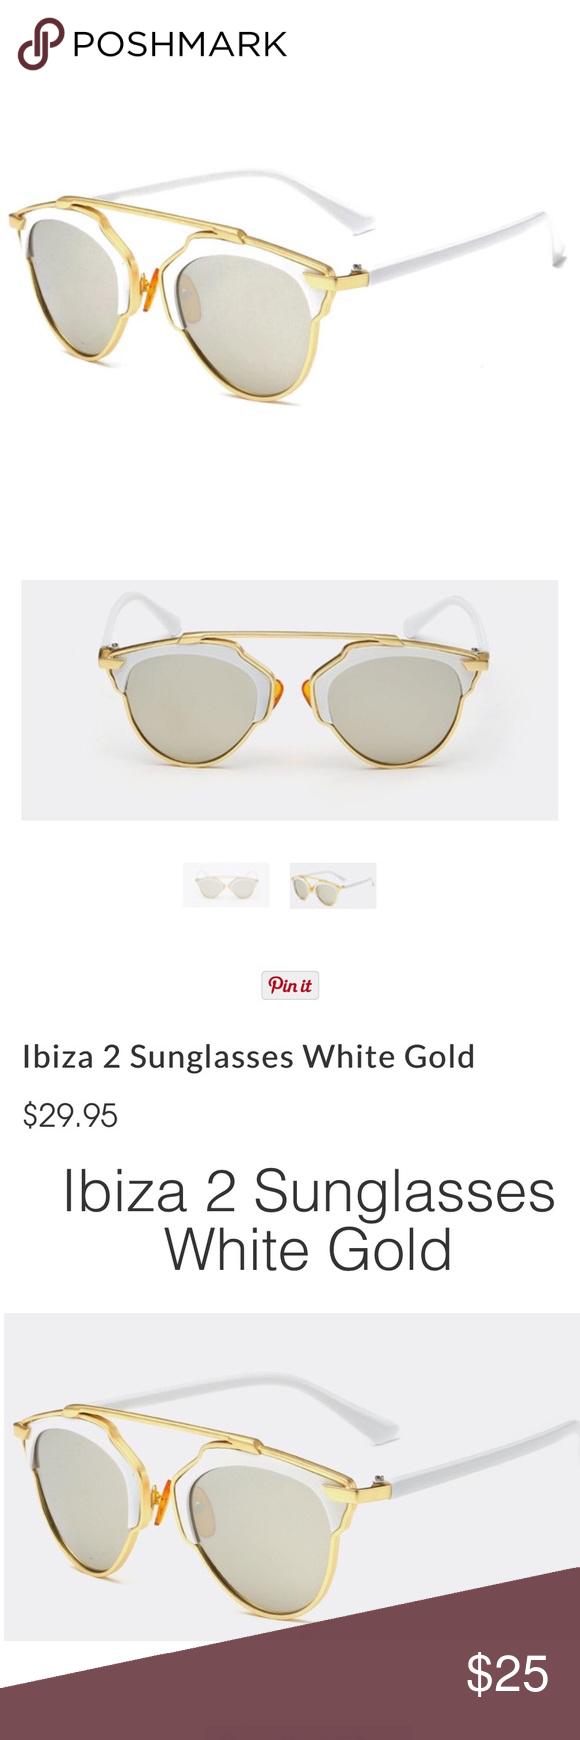 Ibiza Sunglasses NWT Brand new! Product Description  * 100% UVA / UVB Protection * Polycarbonte UV400 Lens * Colors Available: Silver / not quay Quay Australia Accessories Sunglasses